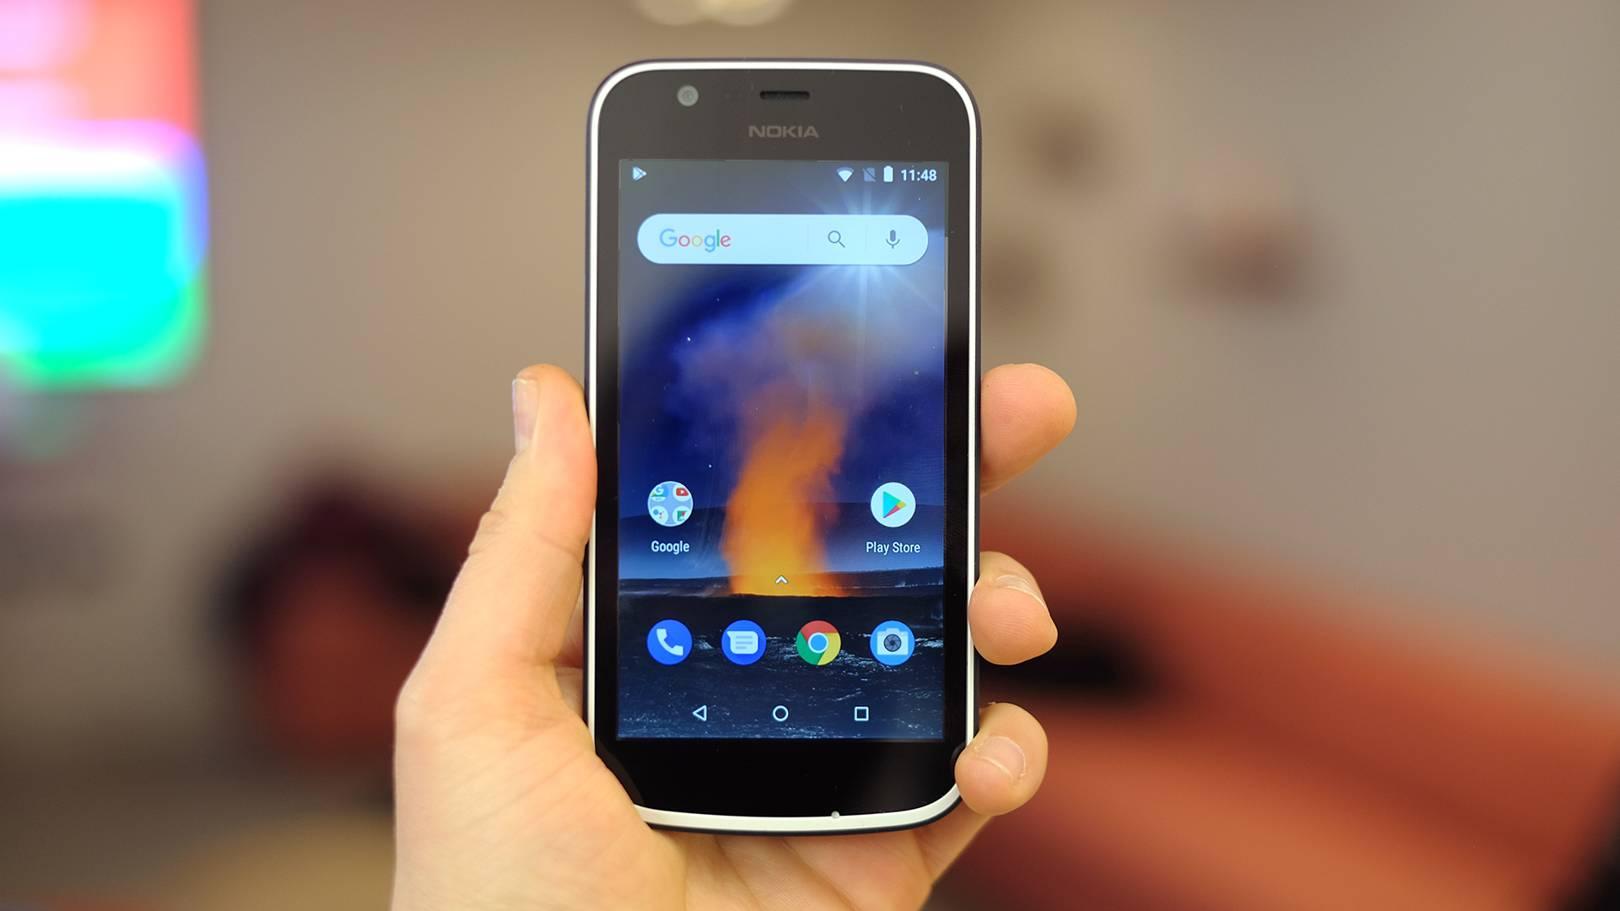 HMD launches Nokia 8110, Nokia 1, and the Nokia 8 Sirocco